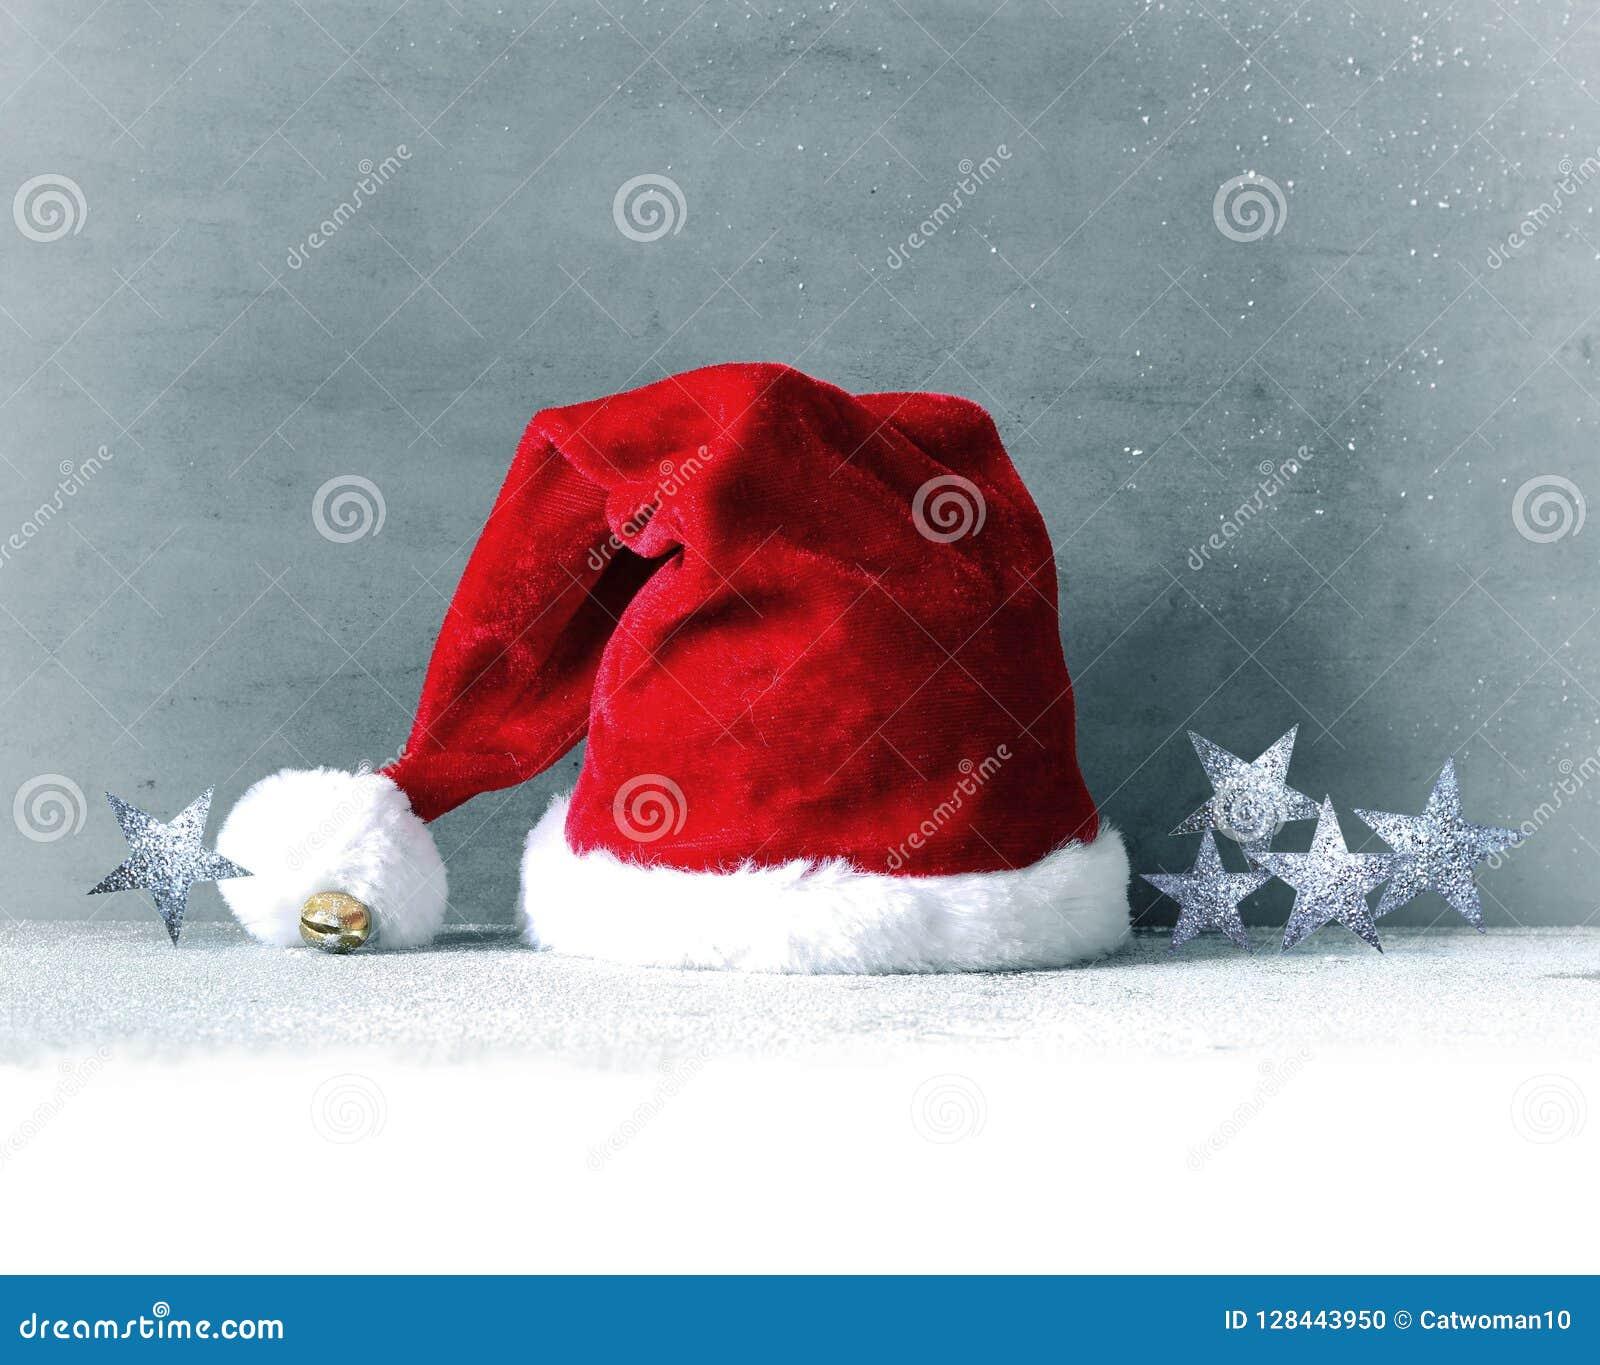 930bebdf124 Santa Hat. Christmas Or New Year Decoration Stock Photo - Image of ...